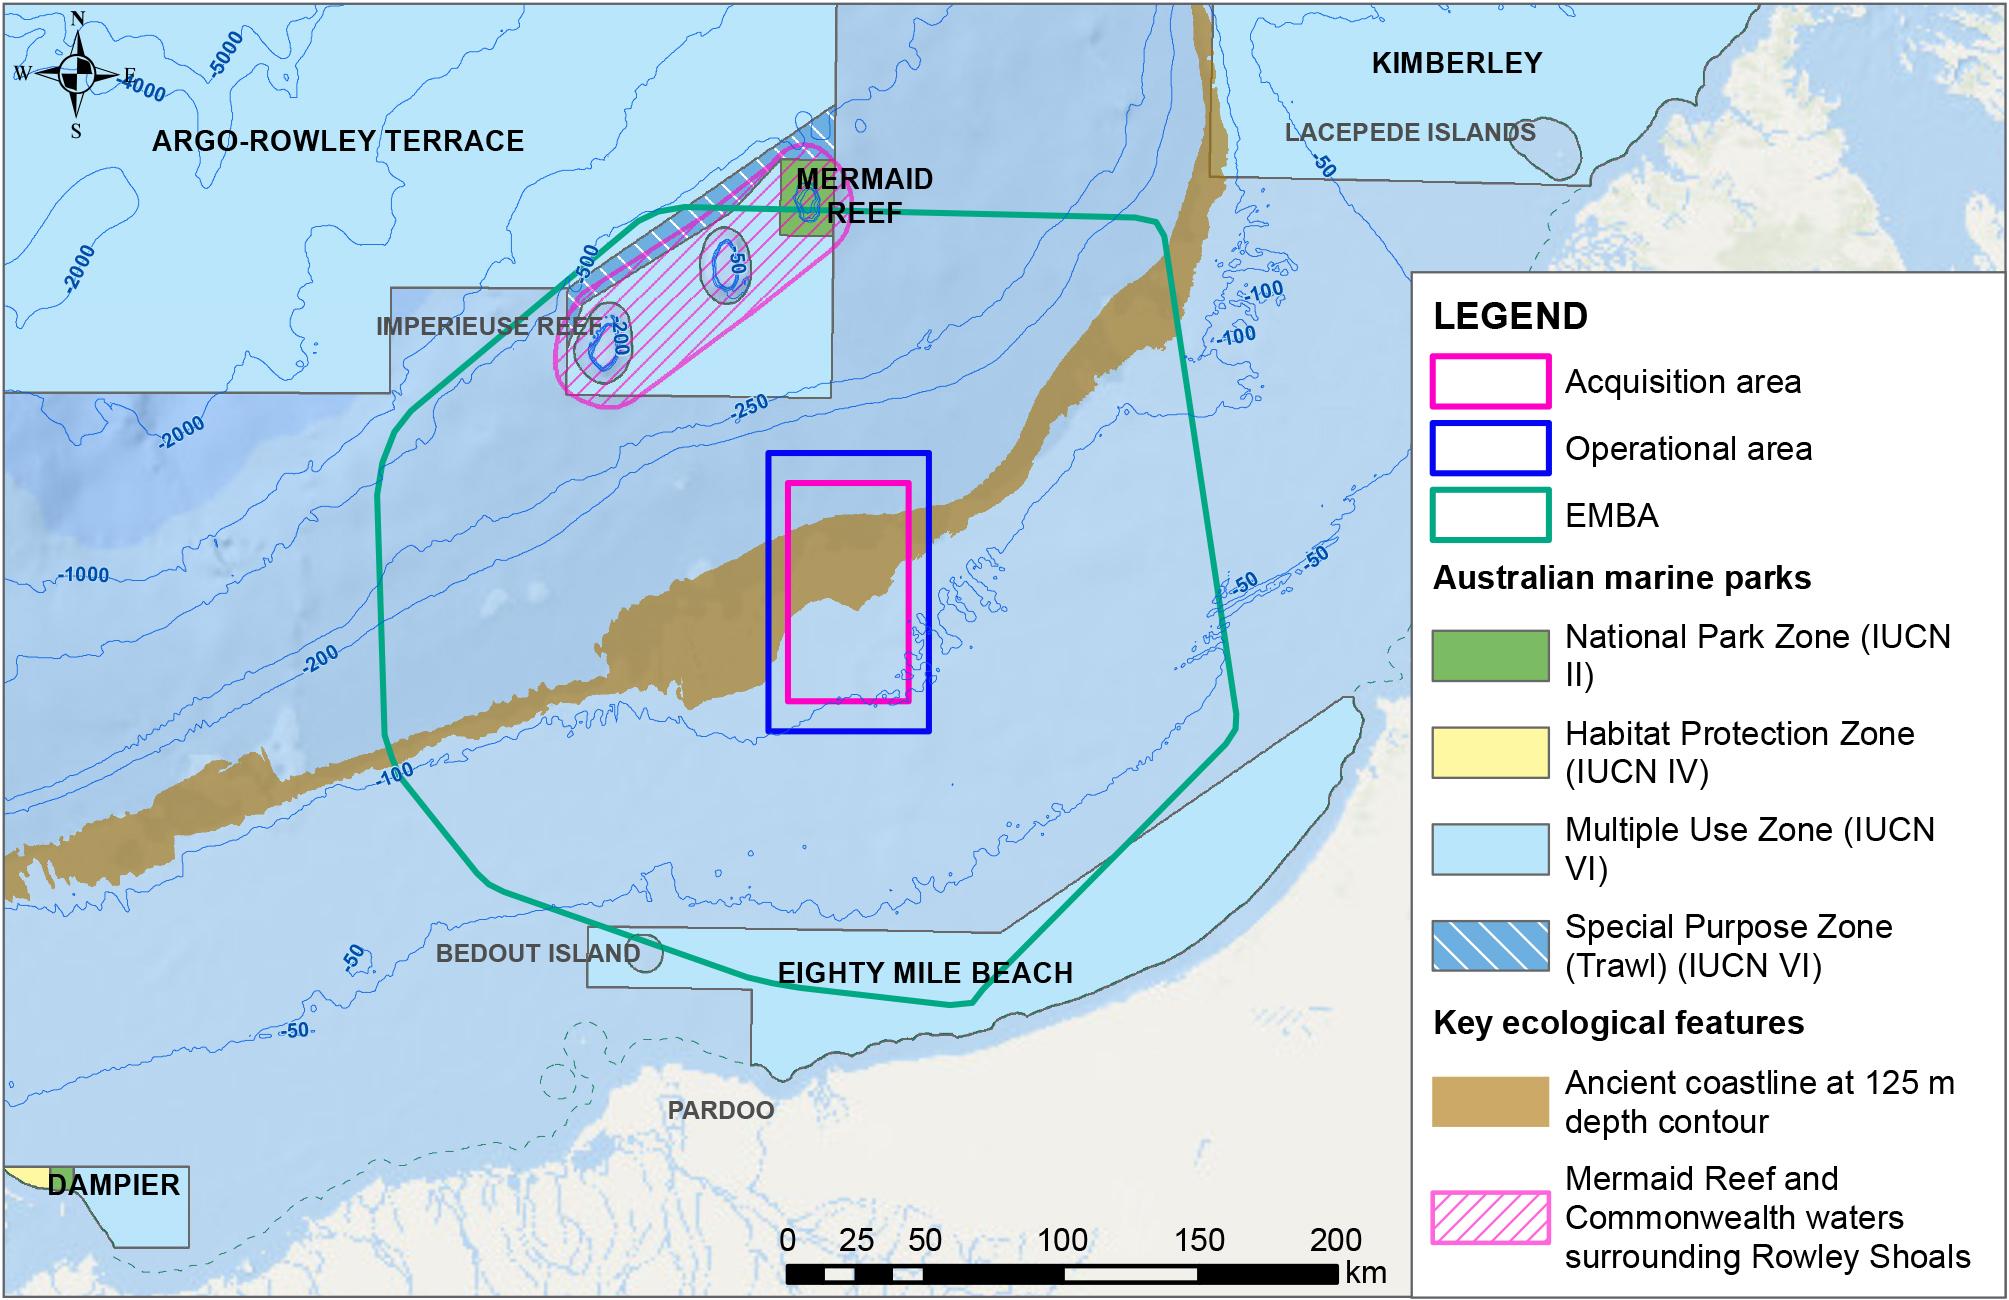 Location map - Activity: Sauropod 3D Marine Seismic Survey  (refer to description)